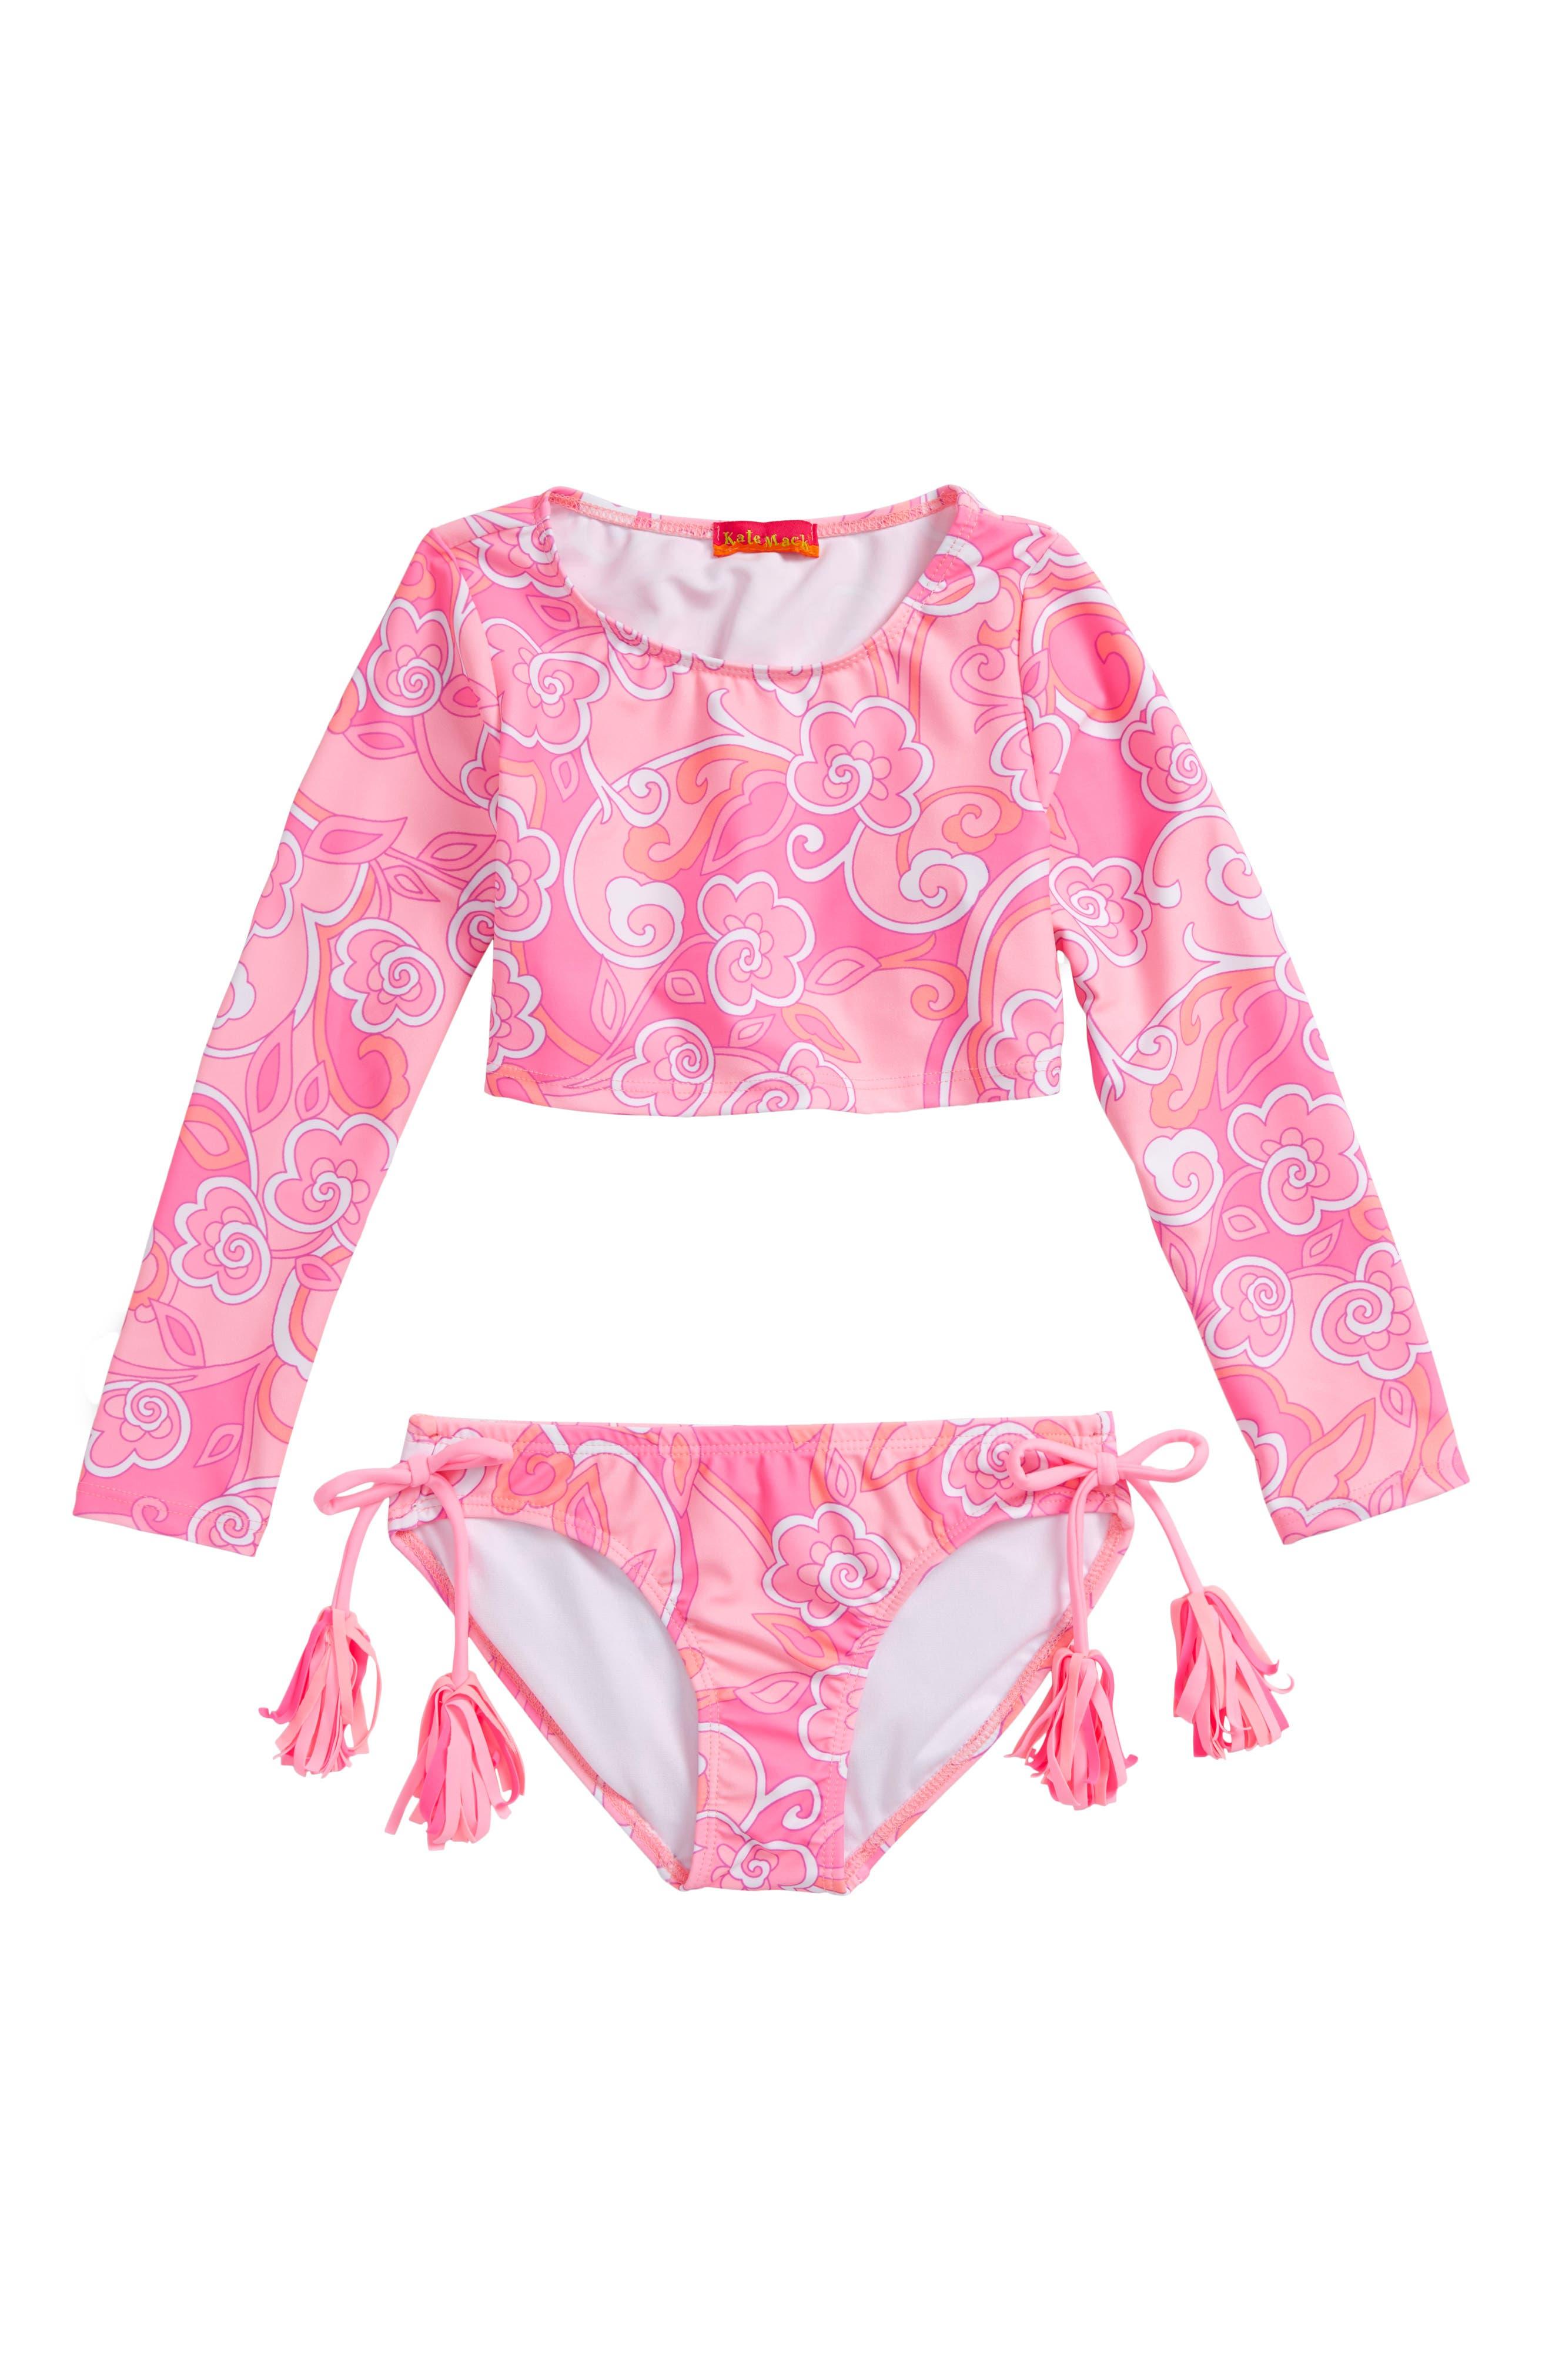 Main Image - Kate Mack Two-Piece Rashguard Swimsuit (Little Girls)